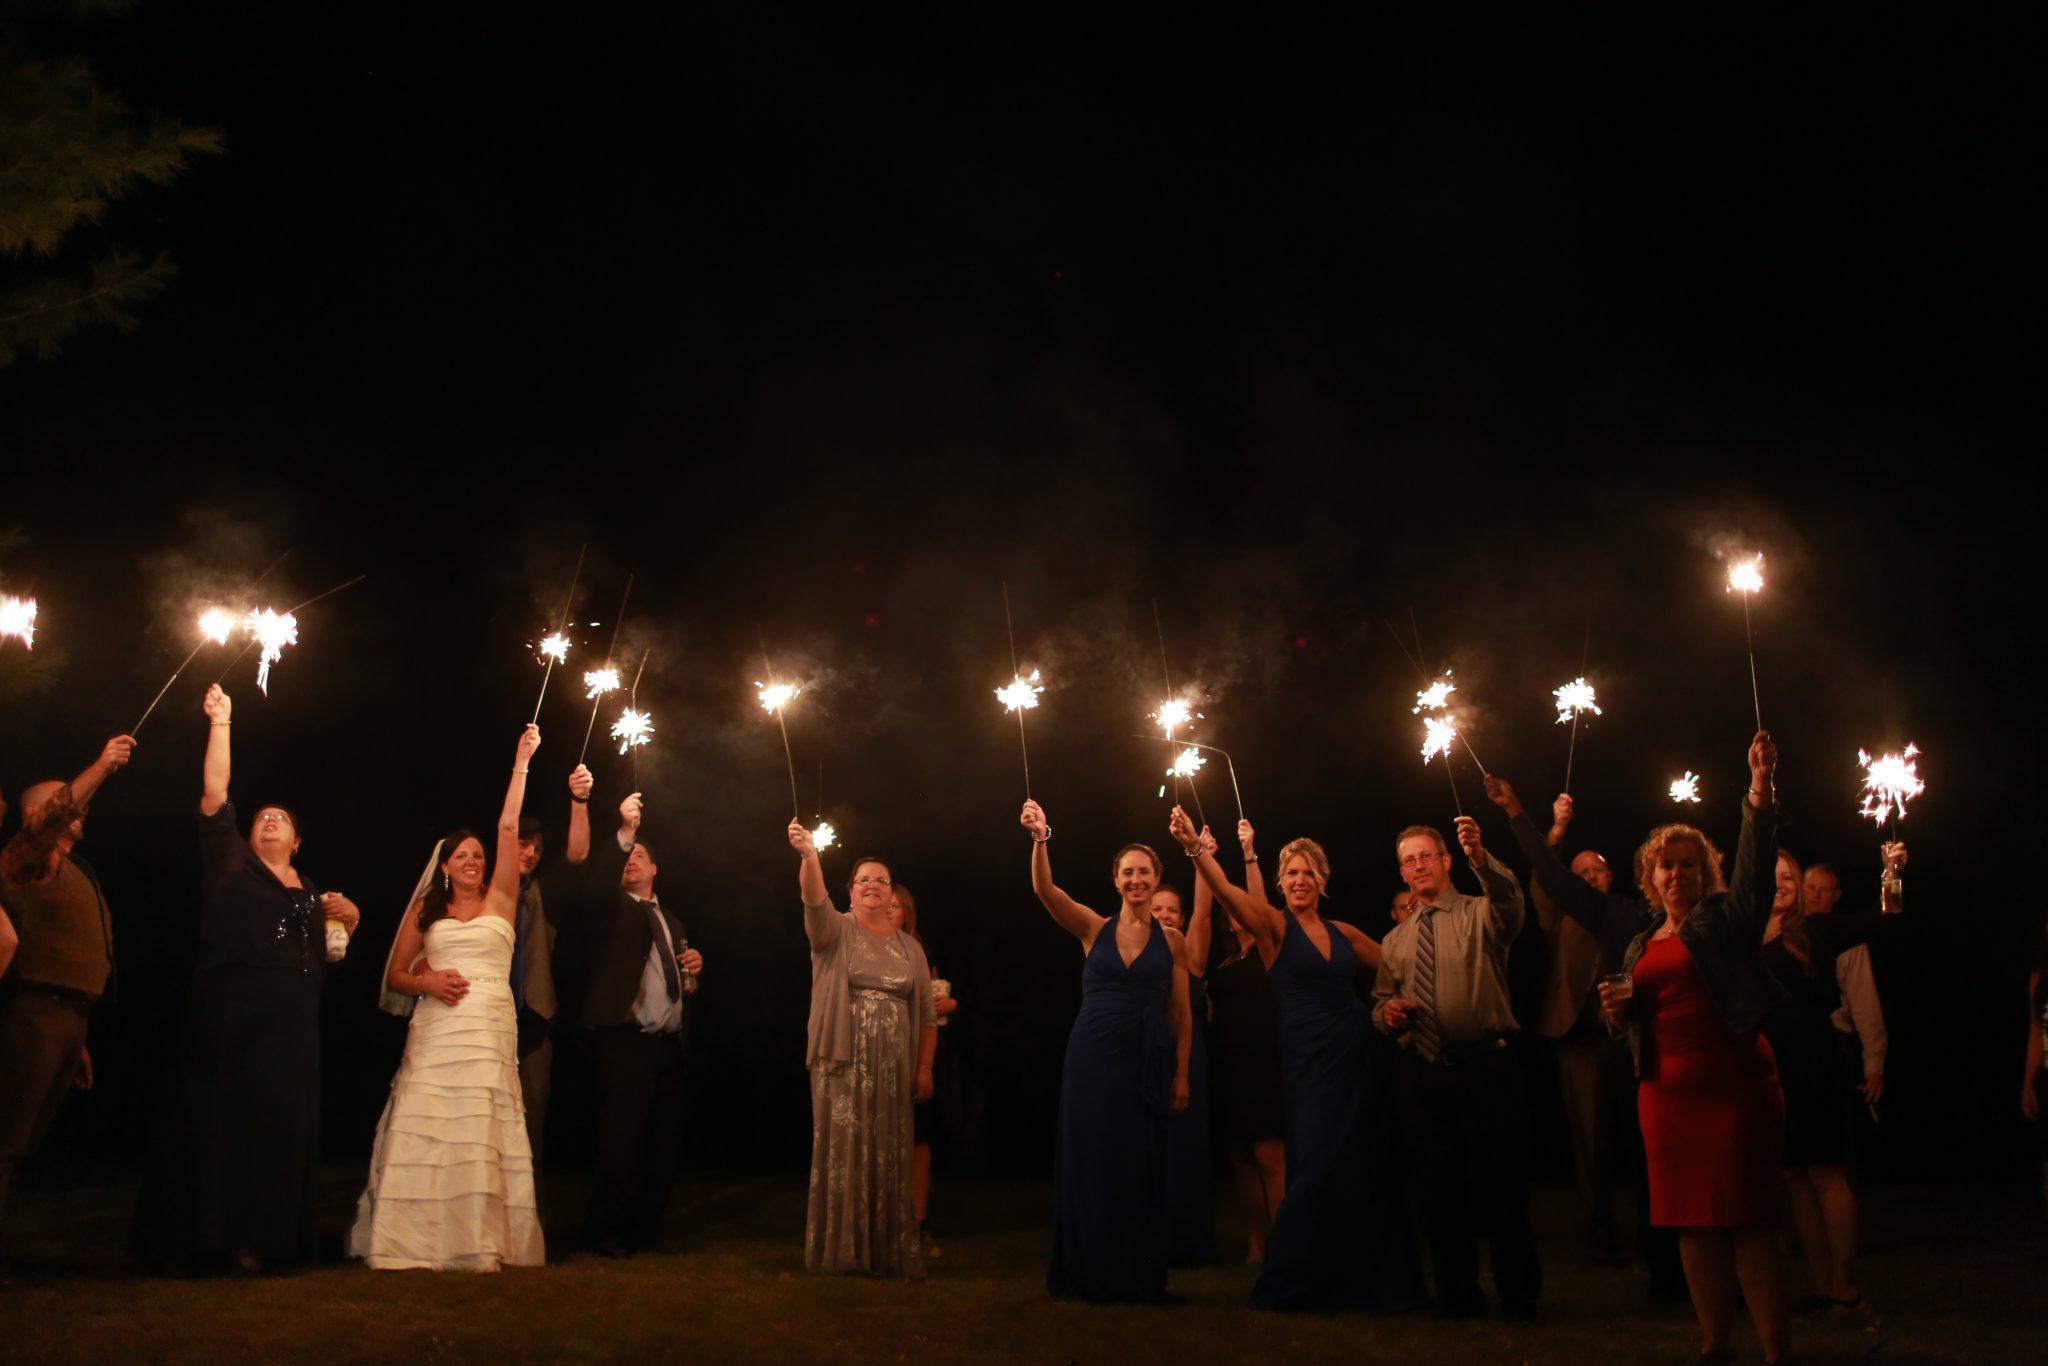 A sparkling wedding finale at OA